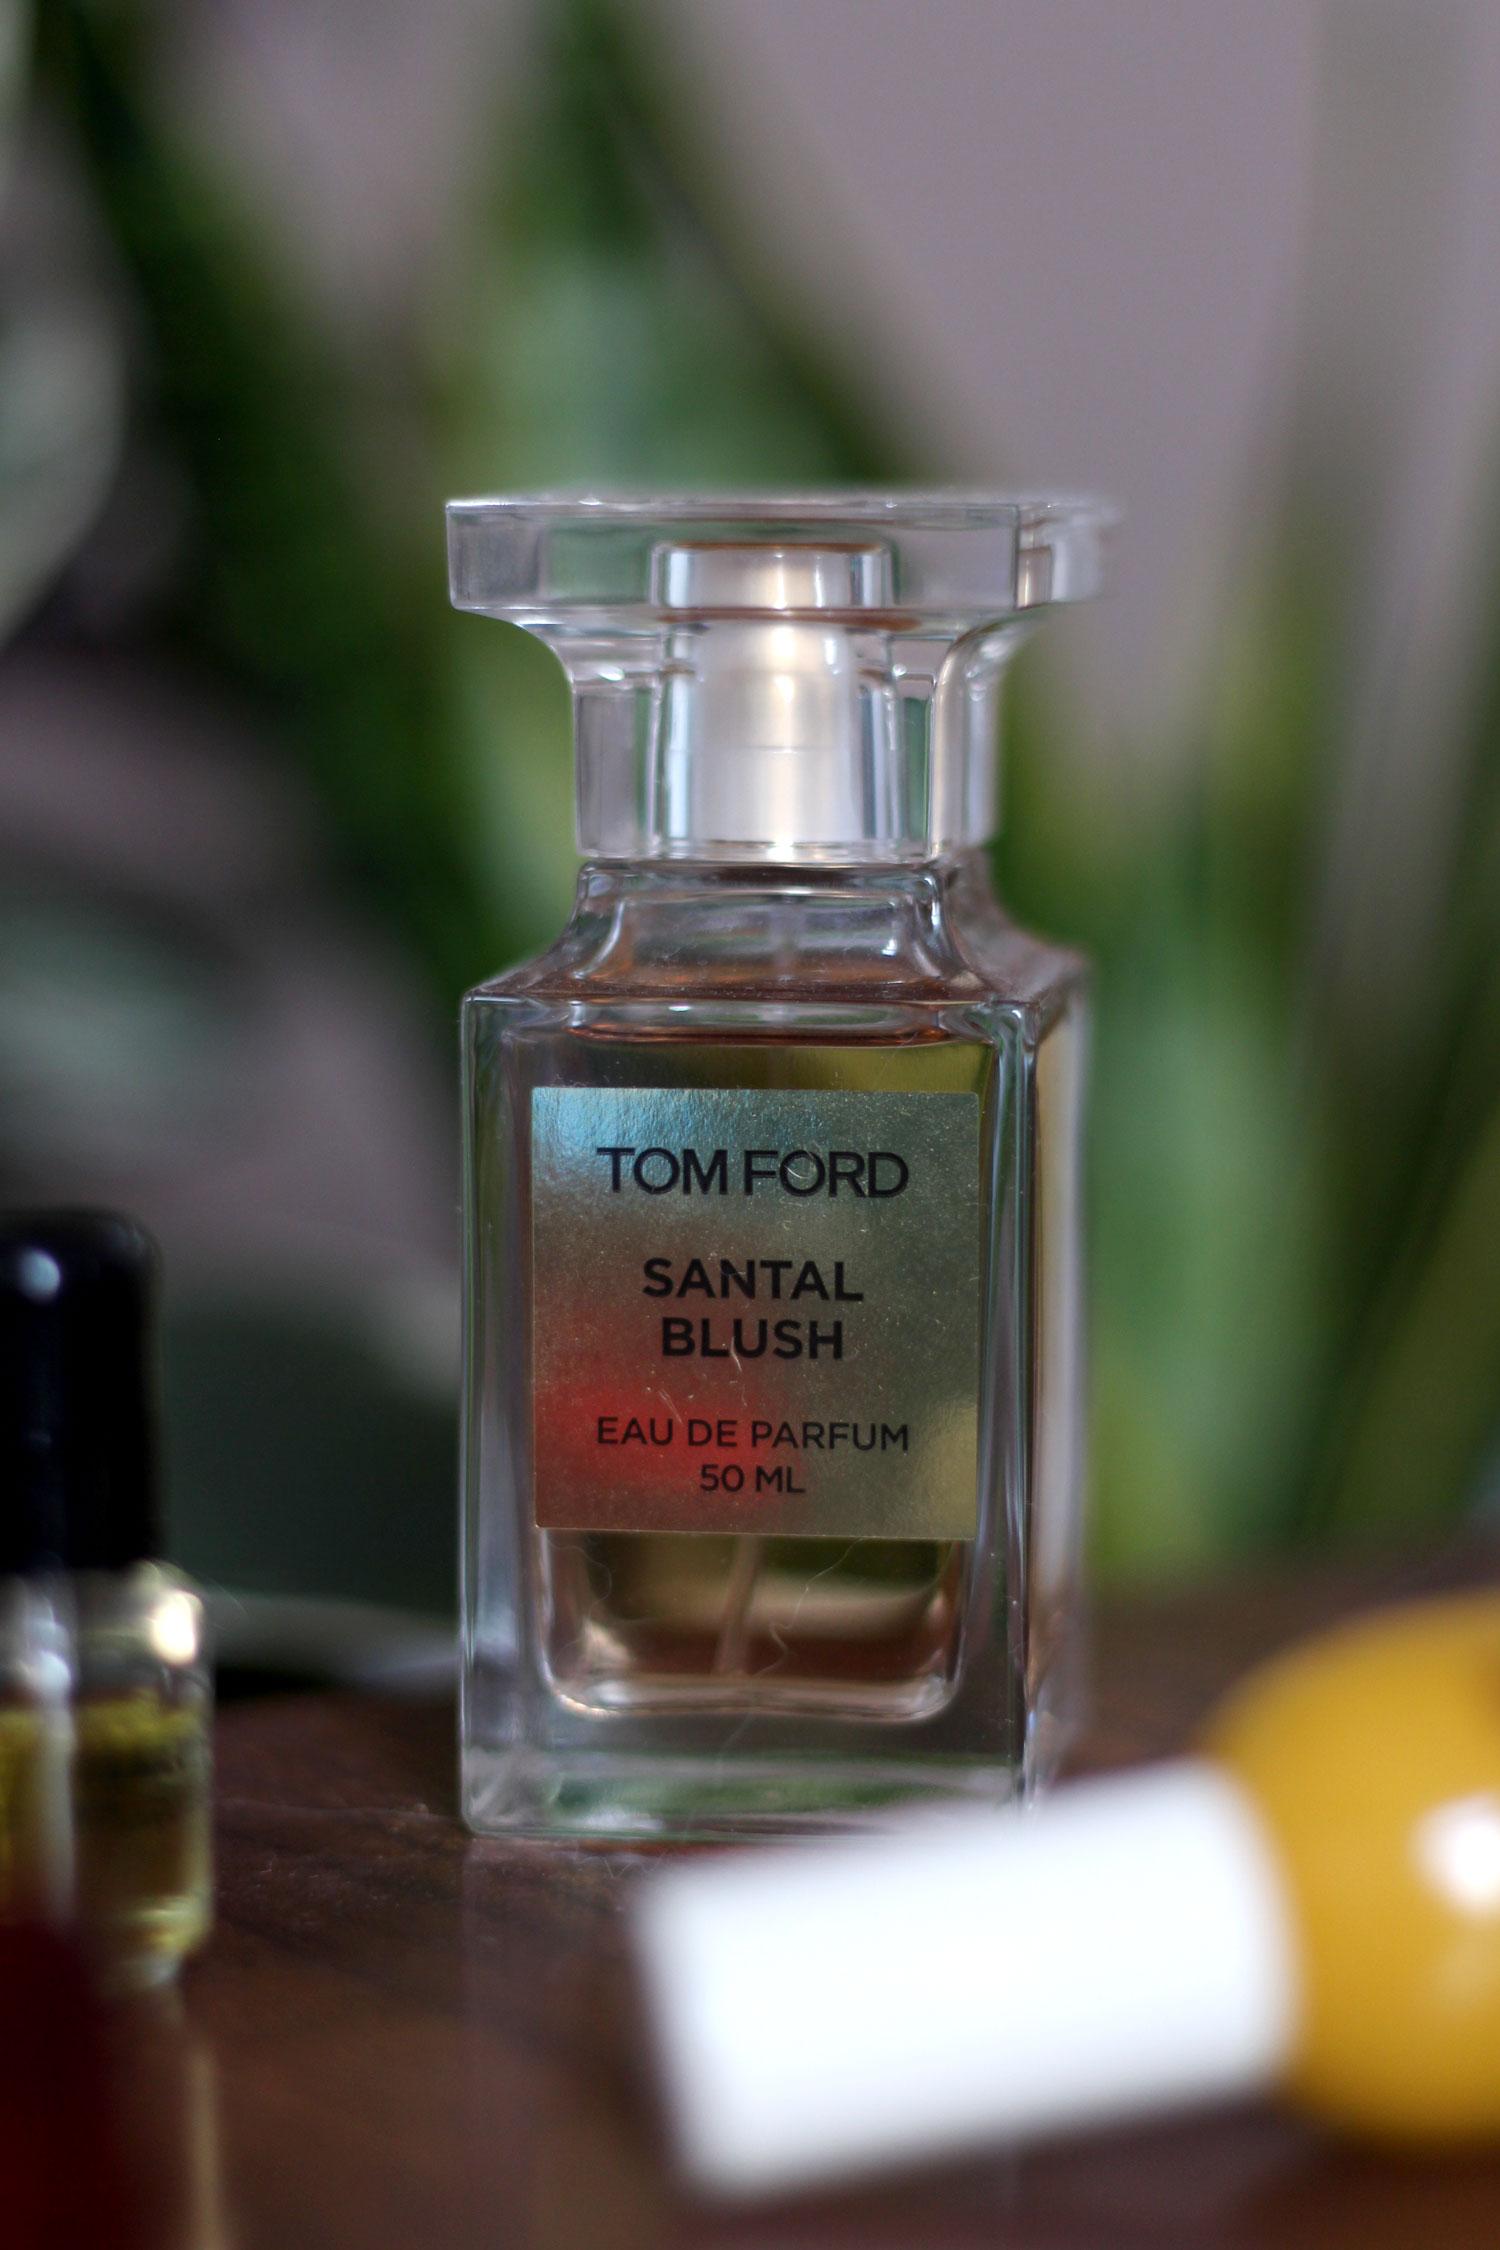 radical-cbd-facial-oil-review-tom-ford-santal-blush-4